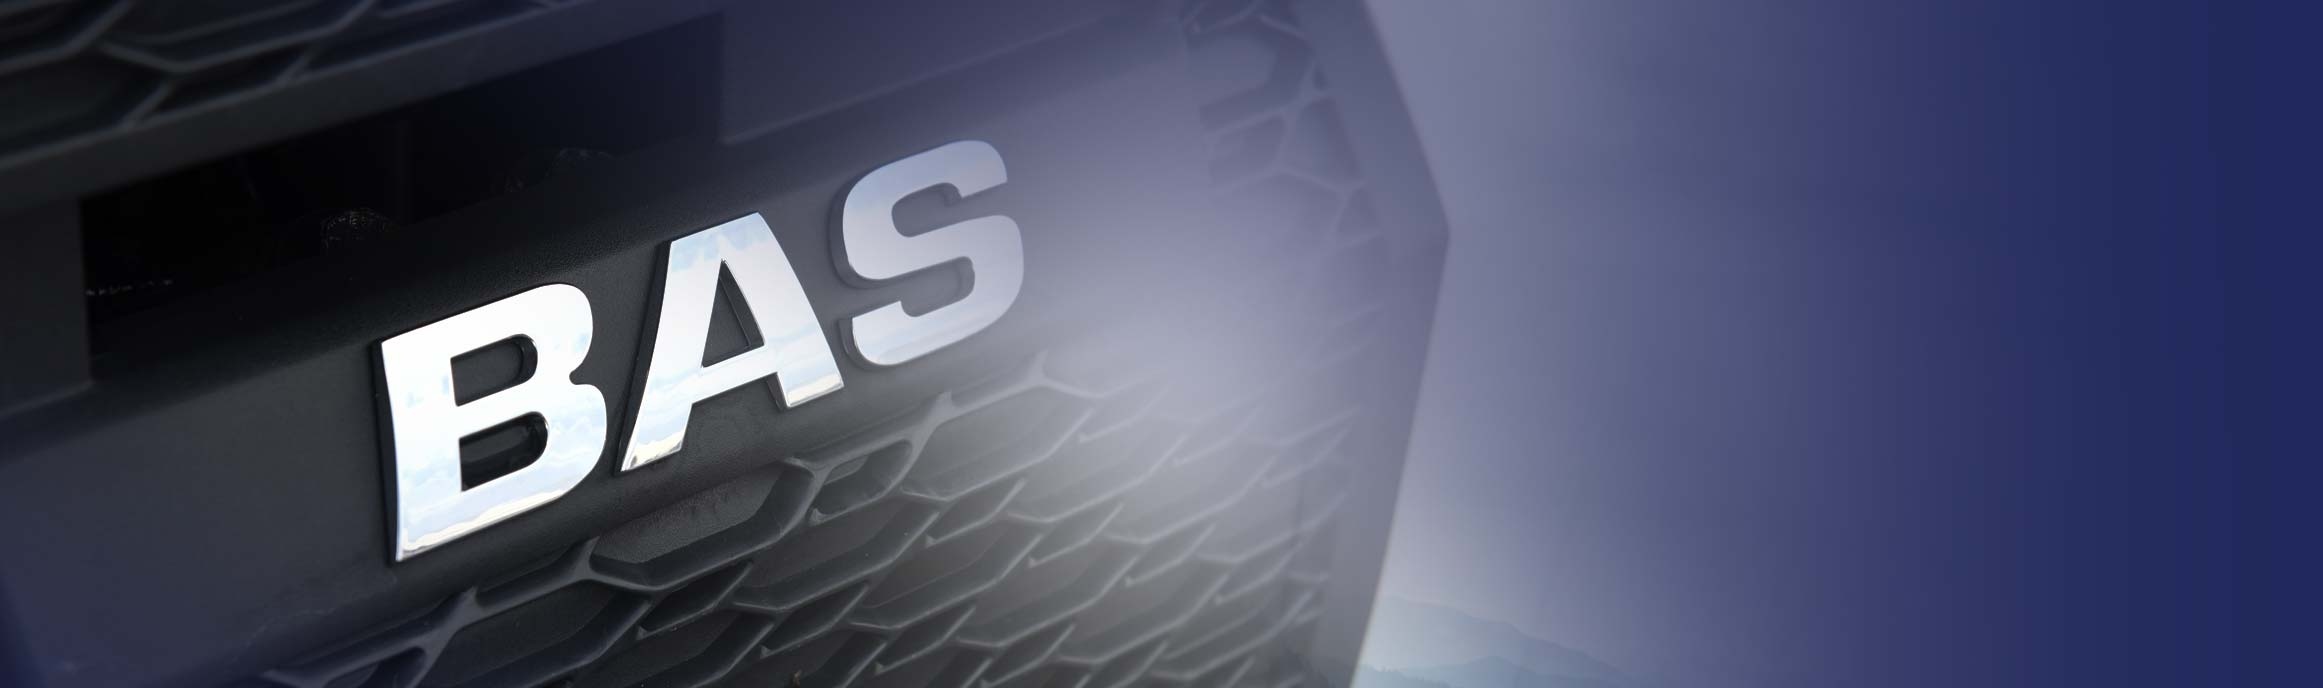 BAS Truck Center privacy statement